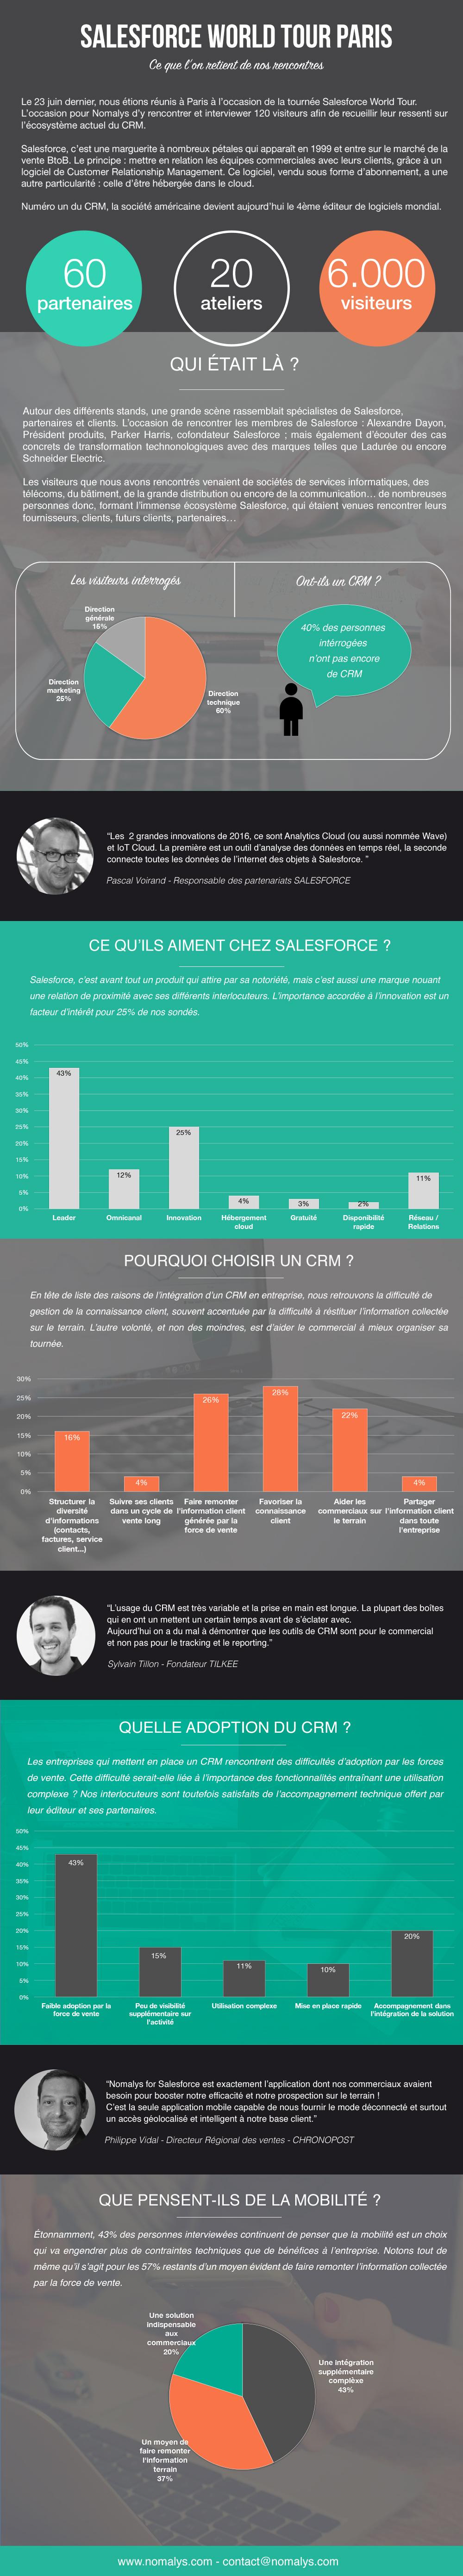 Infographie-SalesforceWorldTour-Nomalys